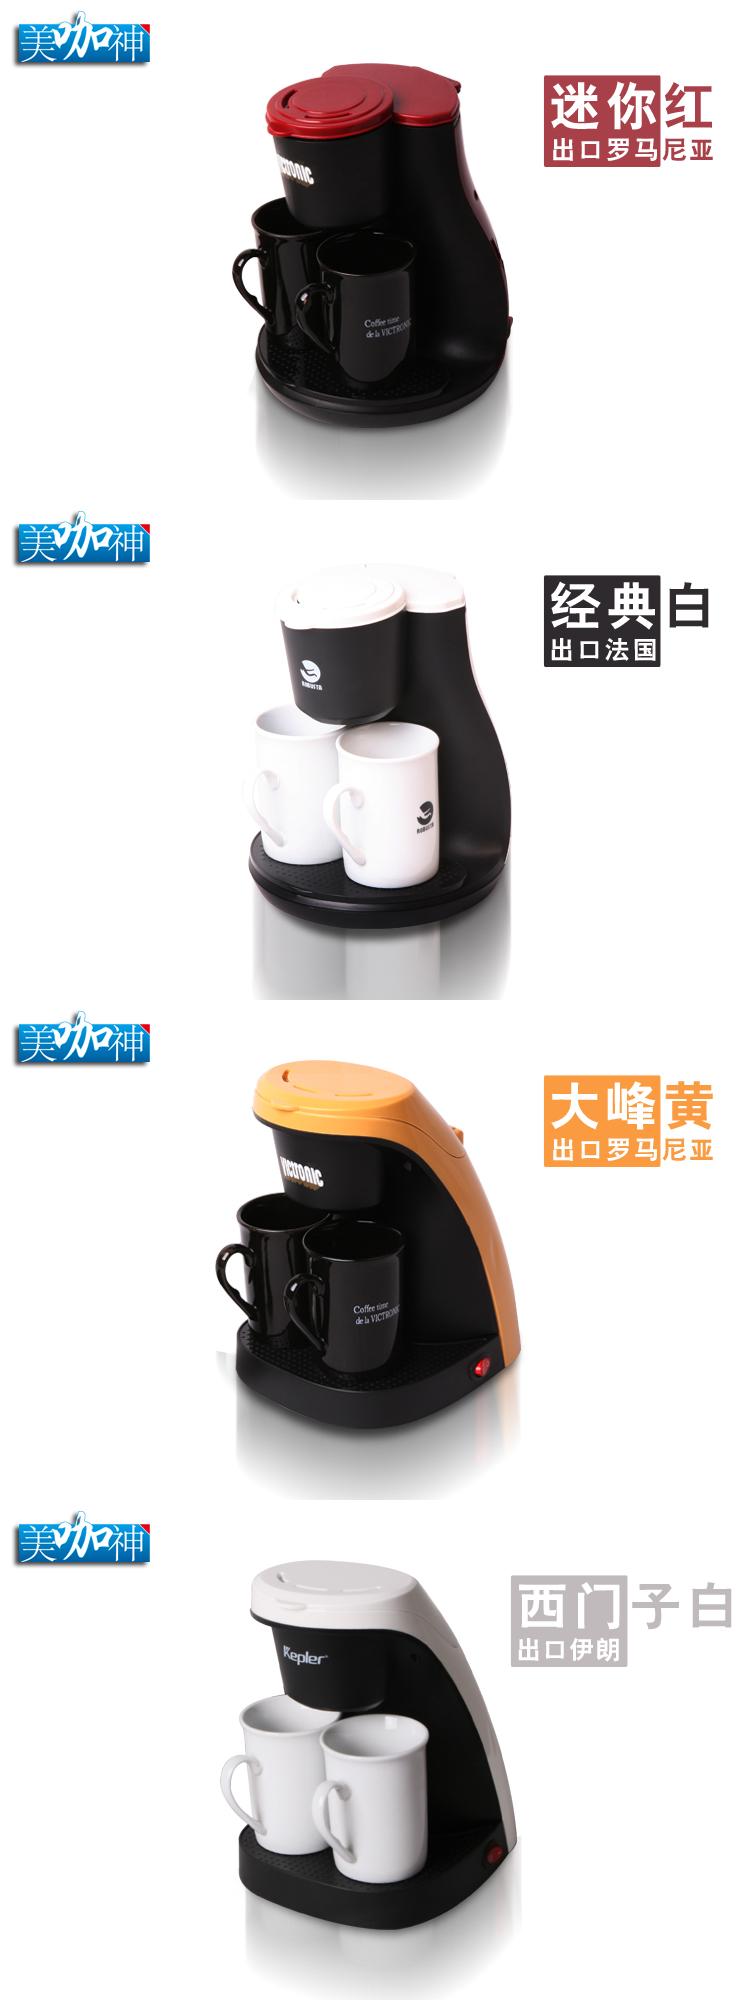 Genuine exquisite American coffee machine  Home make tea machine Drip coffee machine